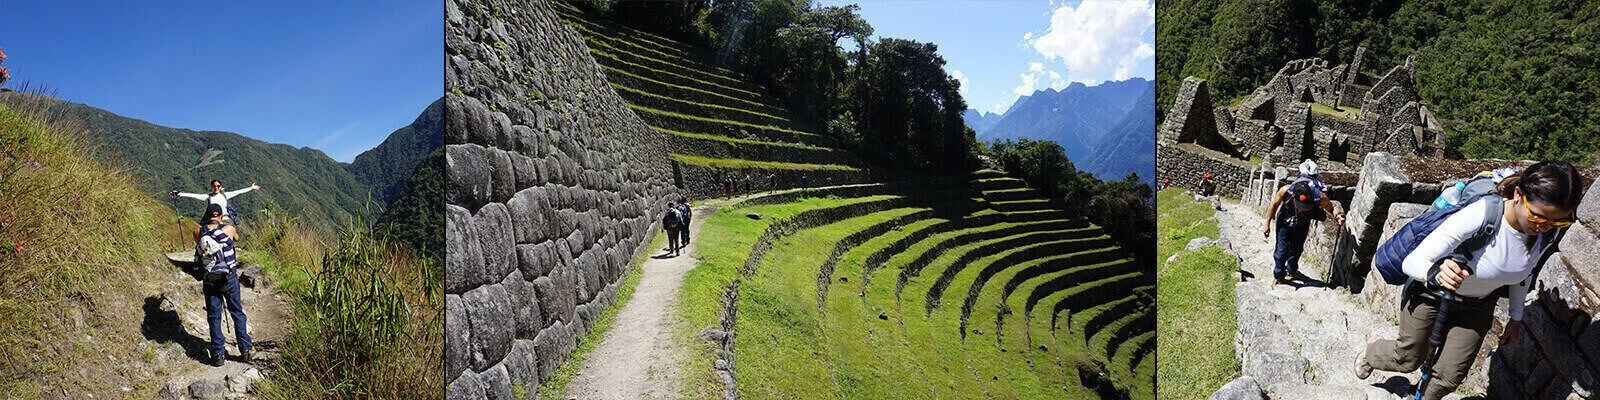 camino-inca-corto-trekking-tours-a-machu-picchu-andes-tours